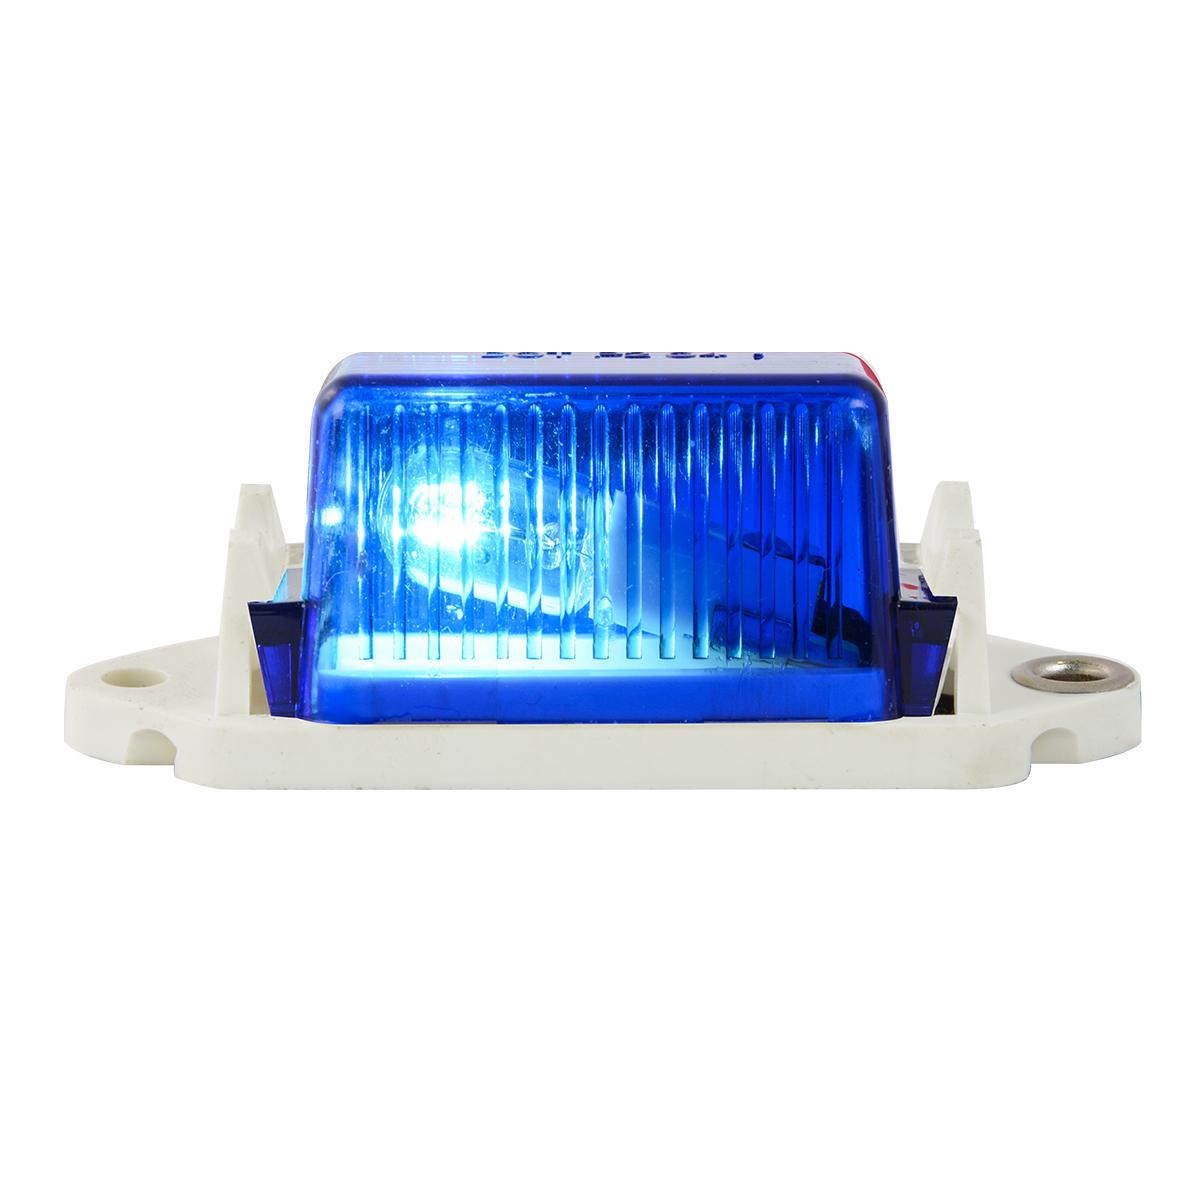 #80252 - Blue Marker Light with White Base